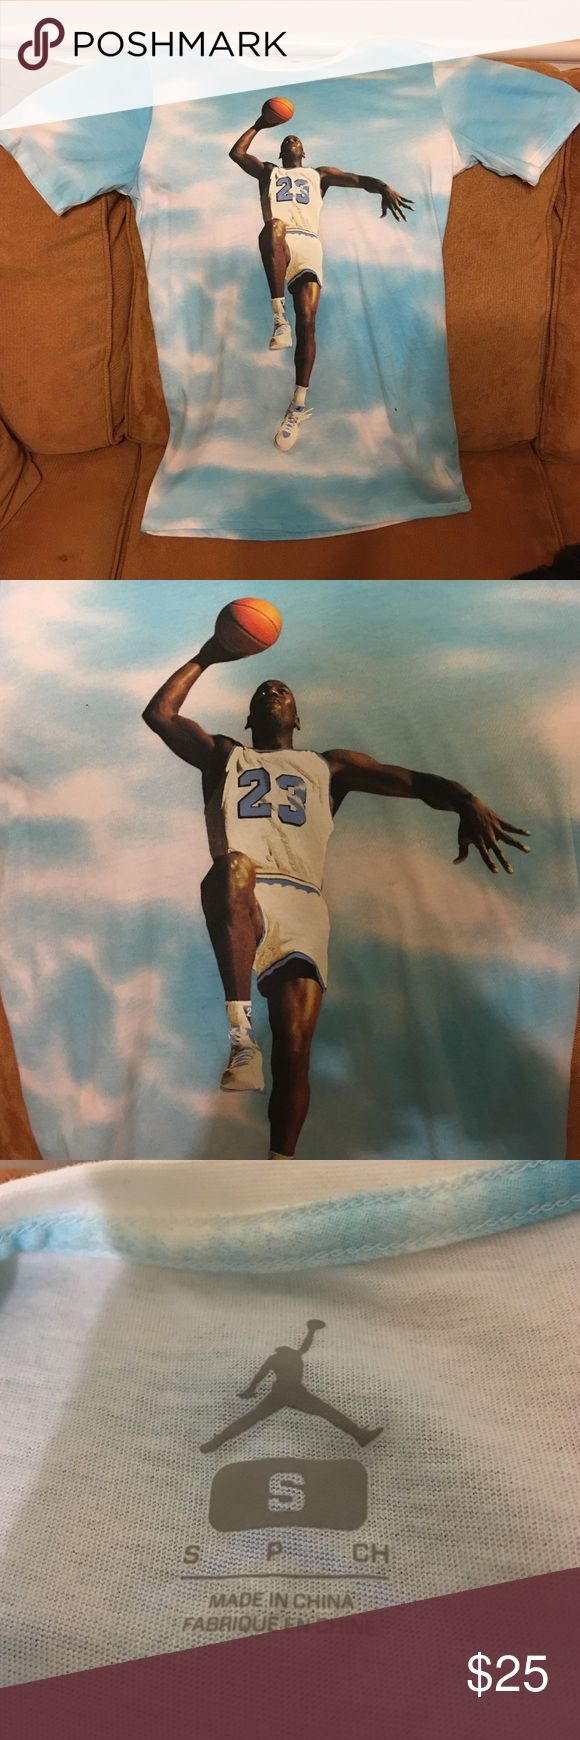 Jordan Tee; Size Small Jordan Tee; Size Small; Blue & White Cloud Michael Jordan 23 Shirt; Barely worn; great condition Jordan Shirts Tees - Short Sleeve